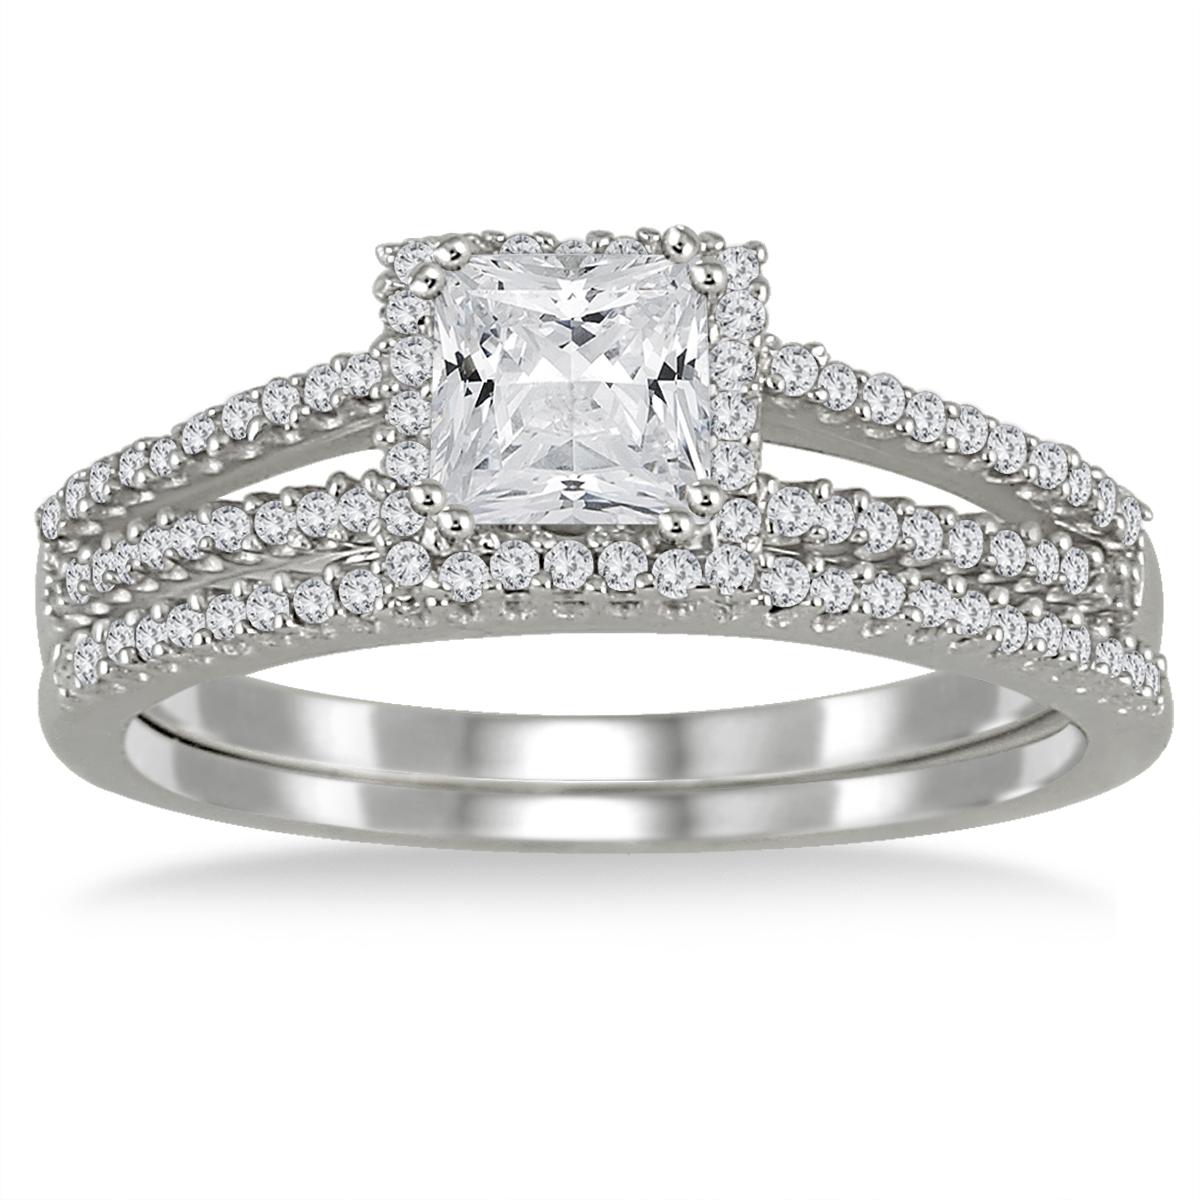 4/5 Carat TW Princess Cut Diamond Bridal